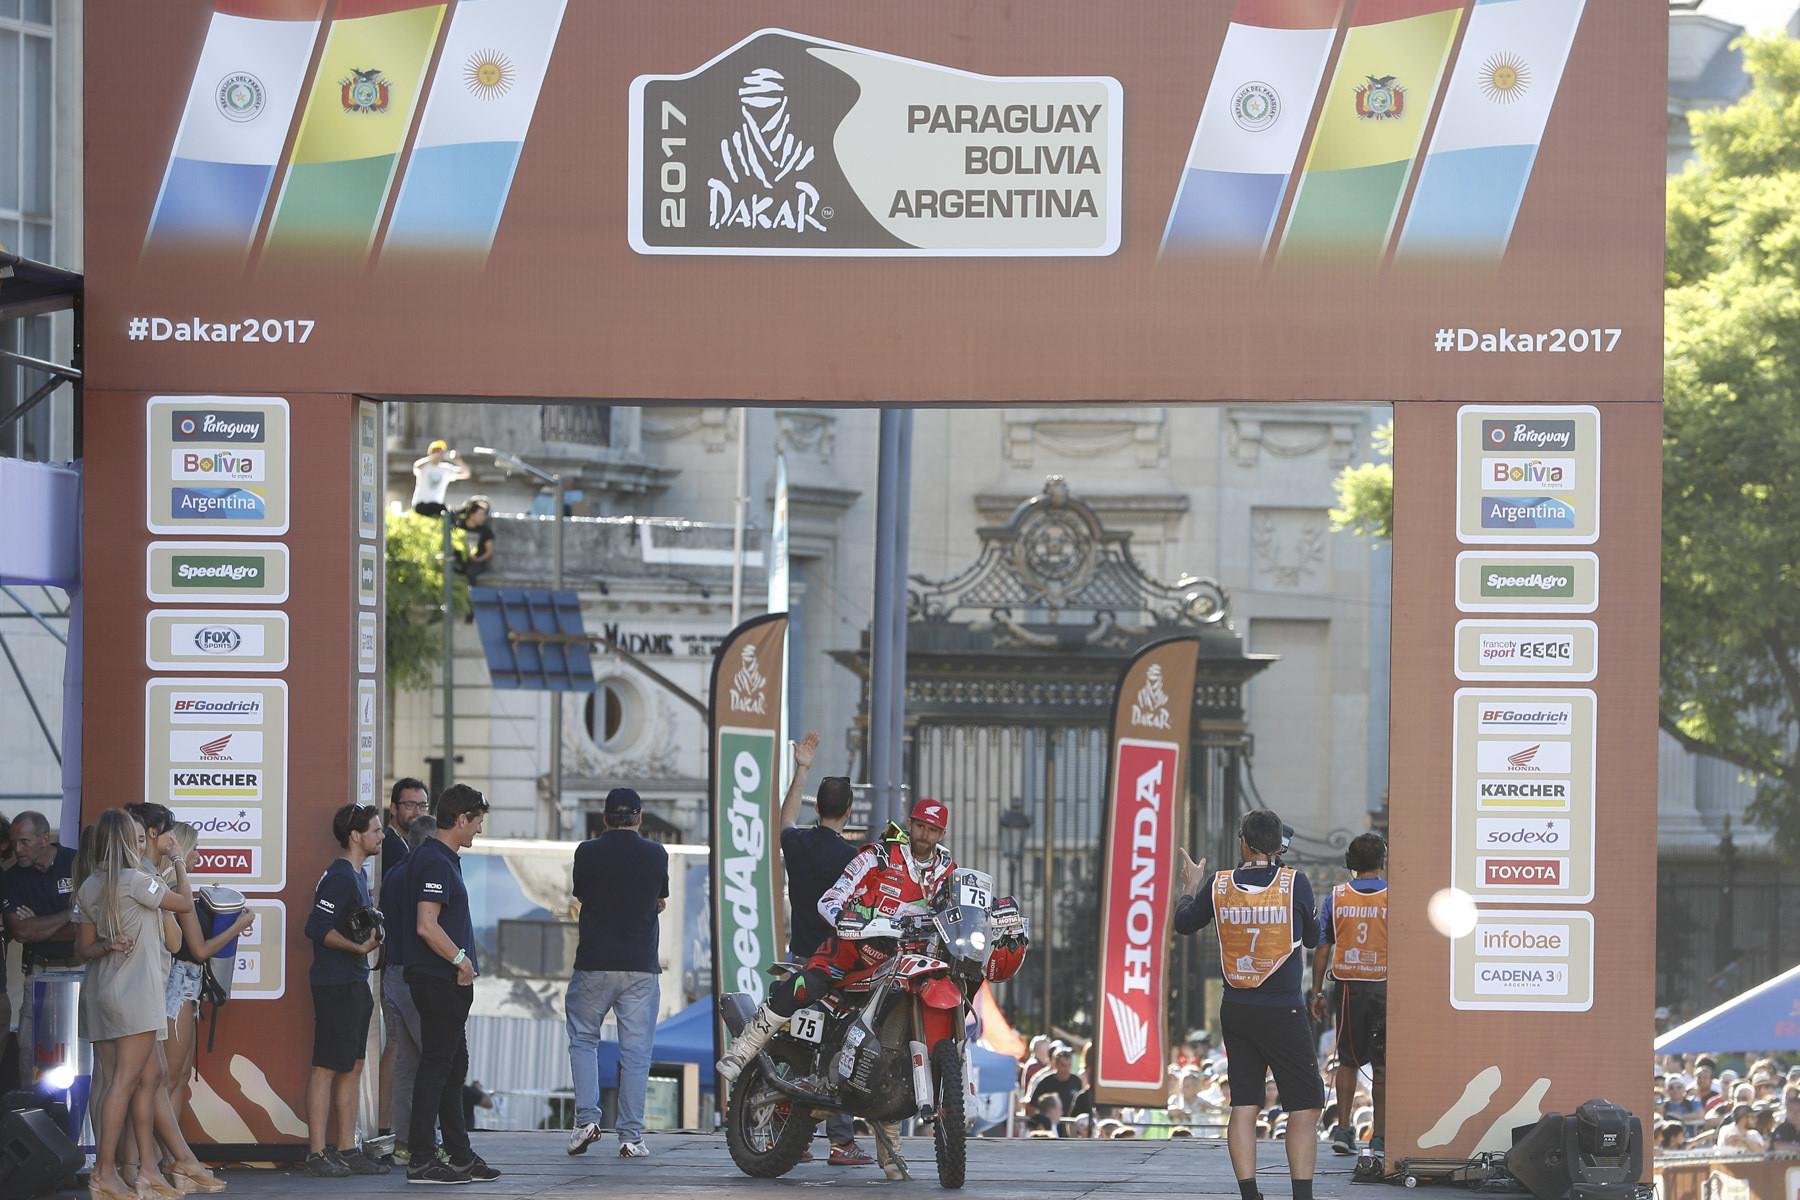 Pedro Bianchi Prata festeja nono Dakar terminado